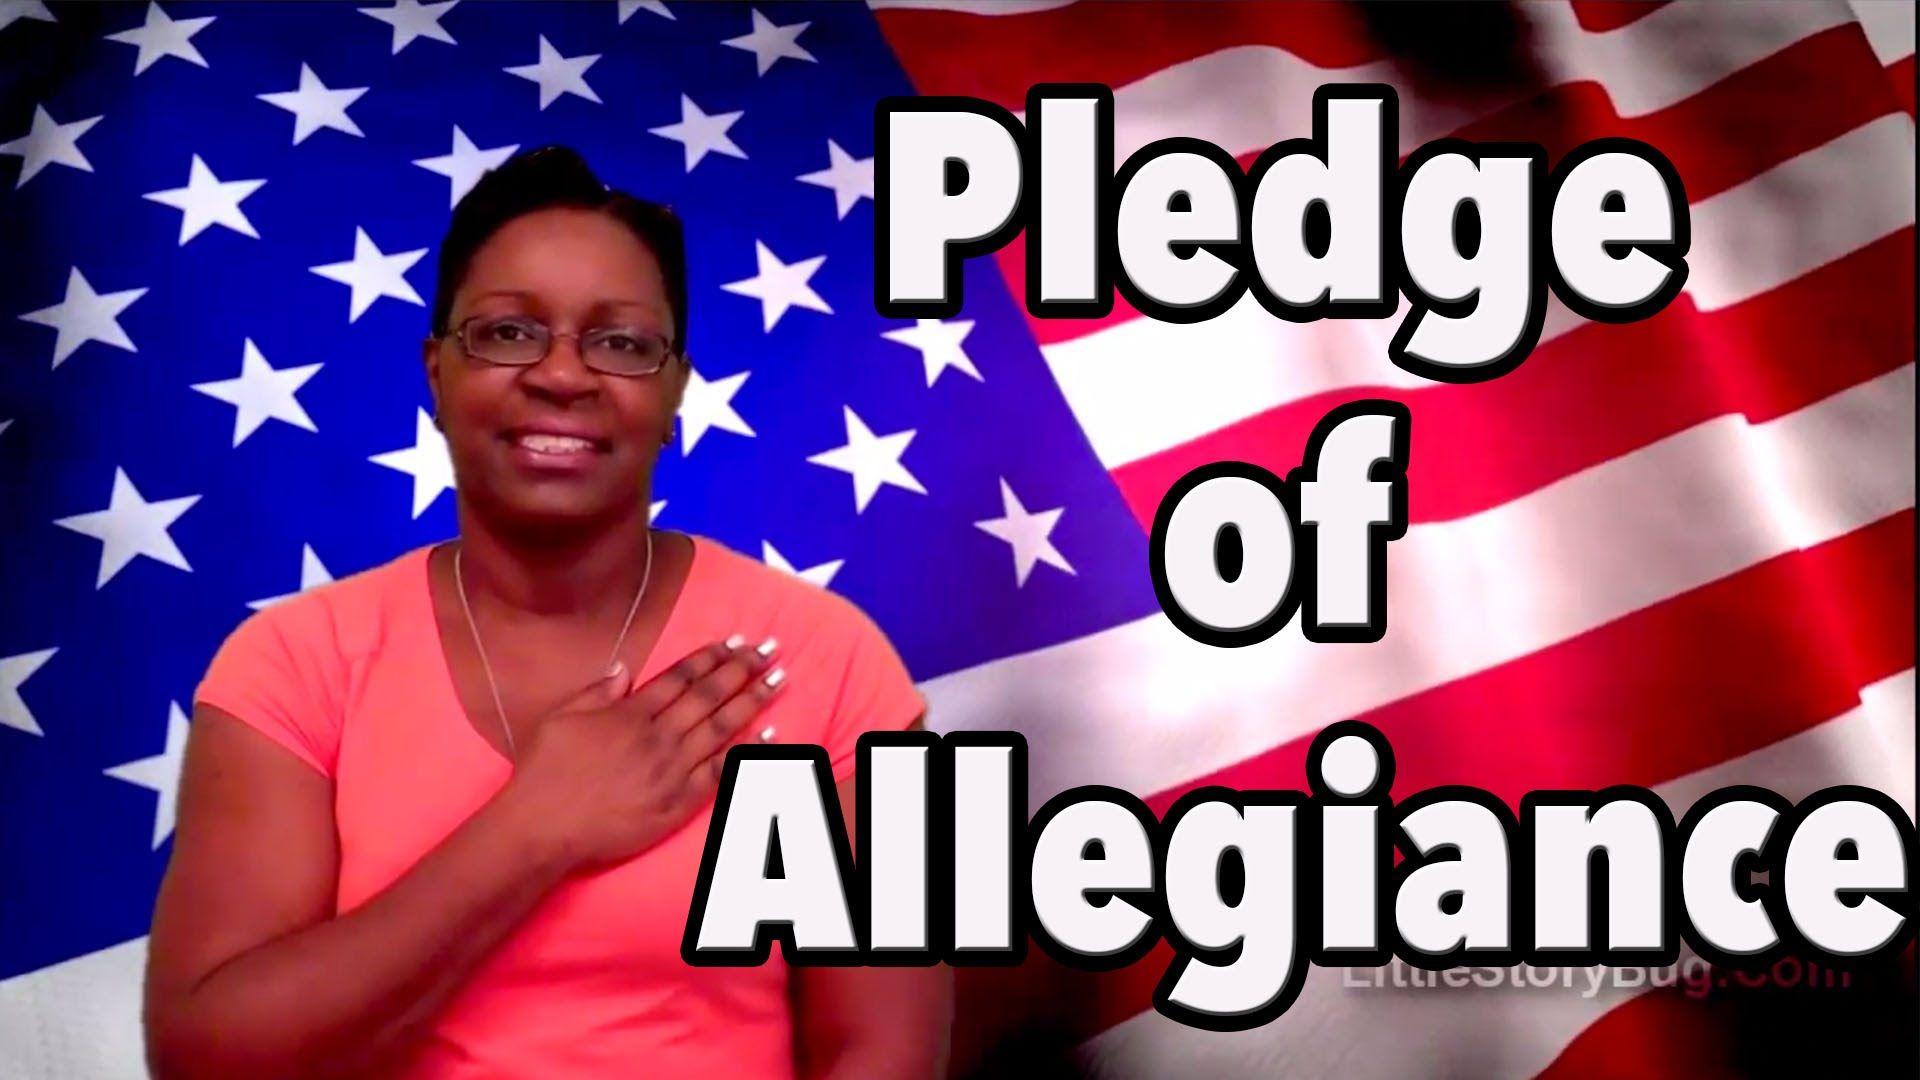 Preschool Pledge Of Allegiance